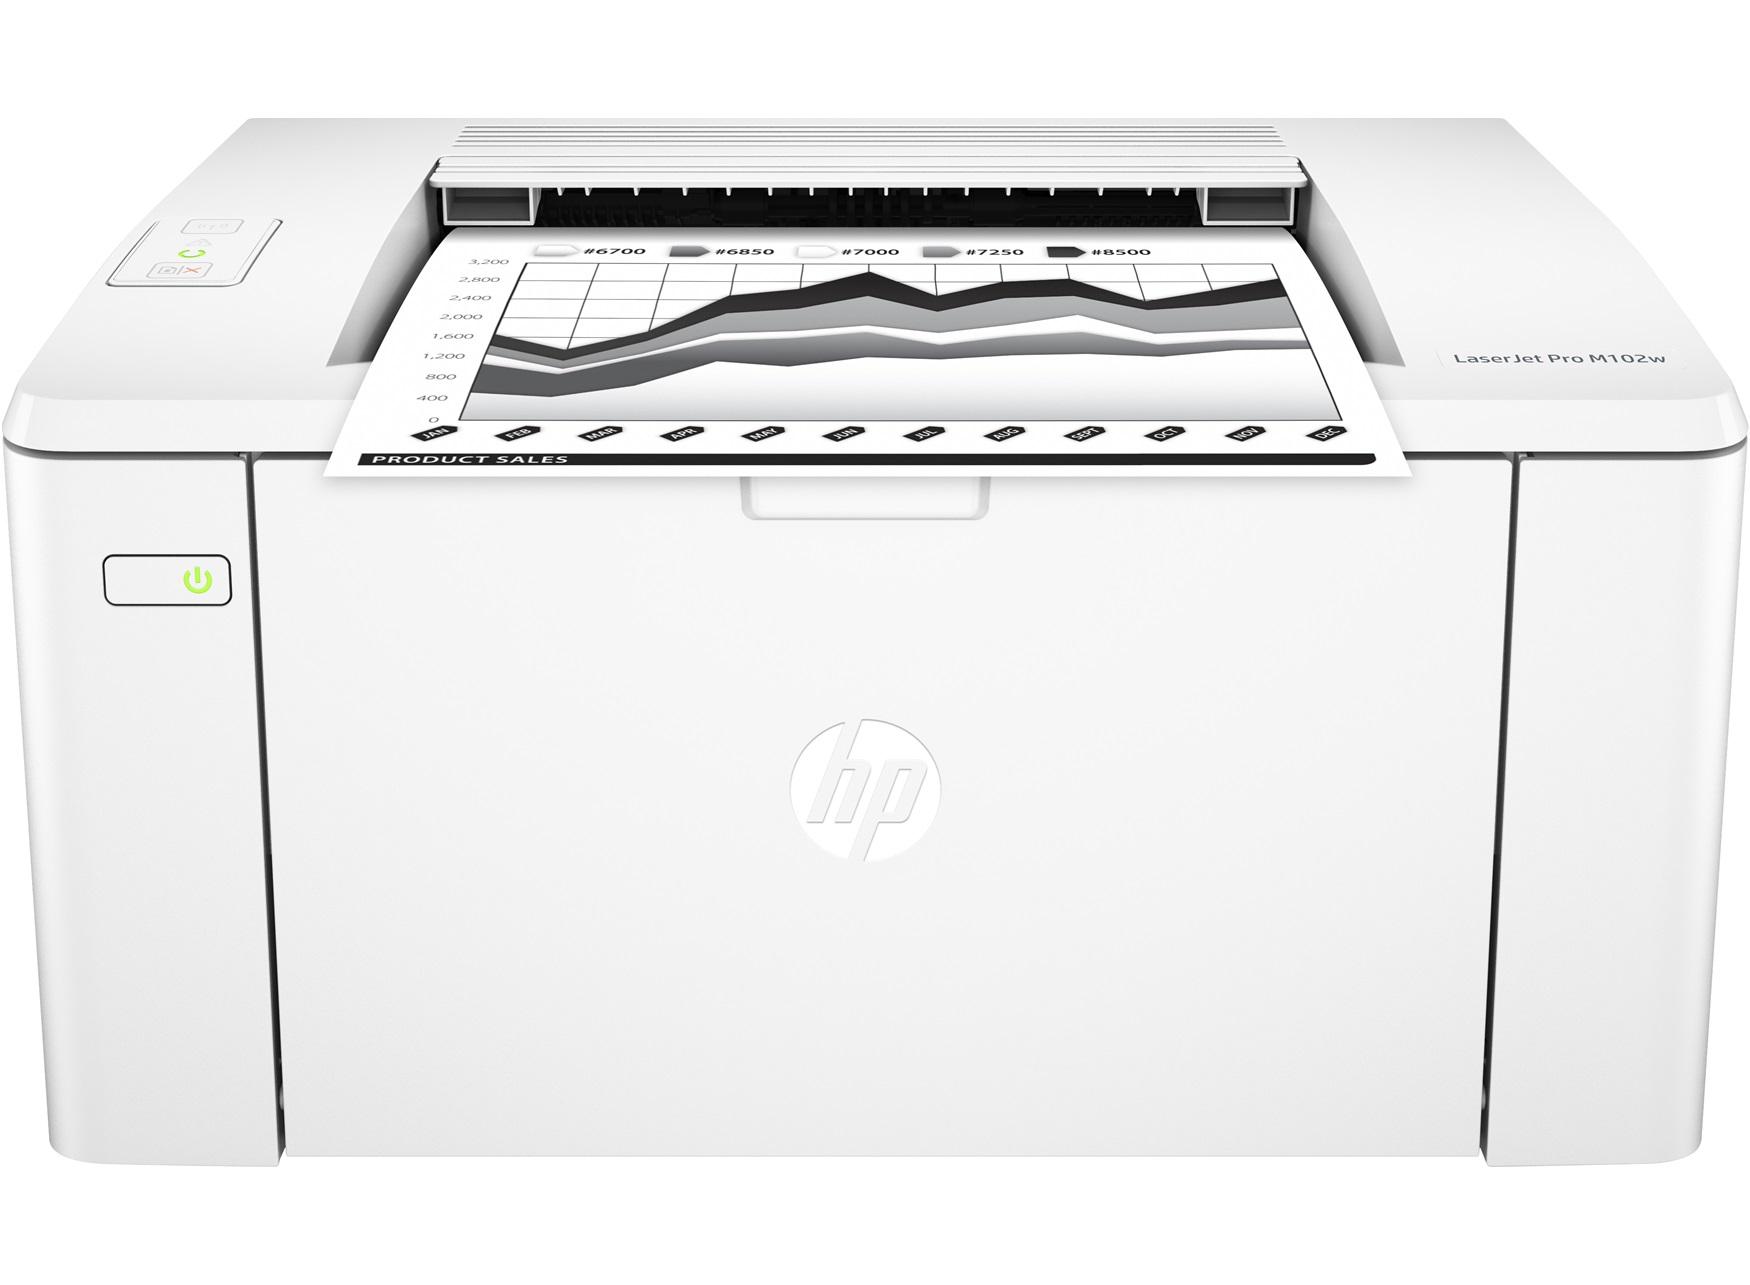 Hewlett-Packard HP LaserJet Pro M102a, Schwarzweiss Laser Drucker, A4, 22 Seiten pro Minute, Drucken